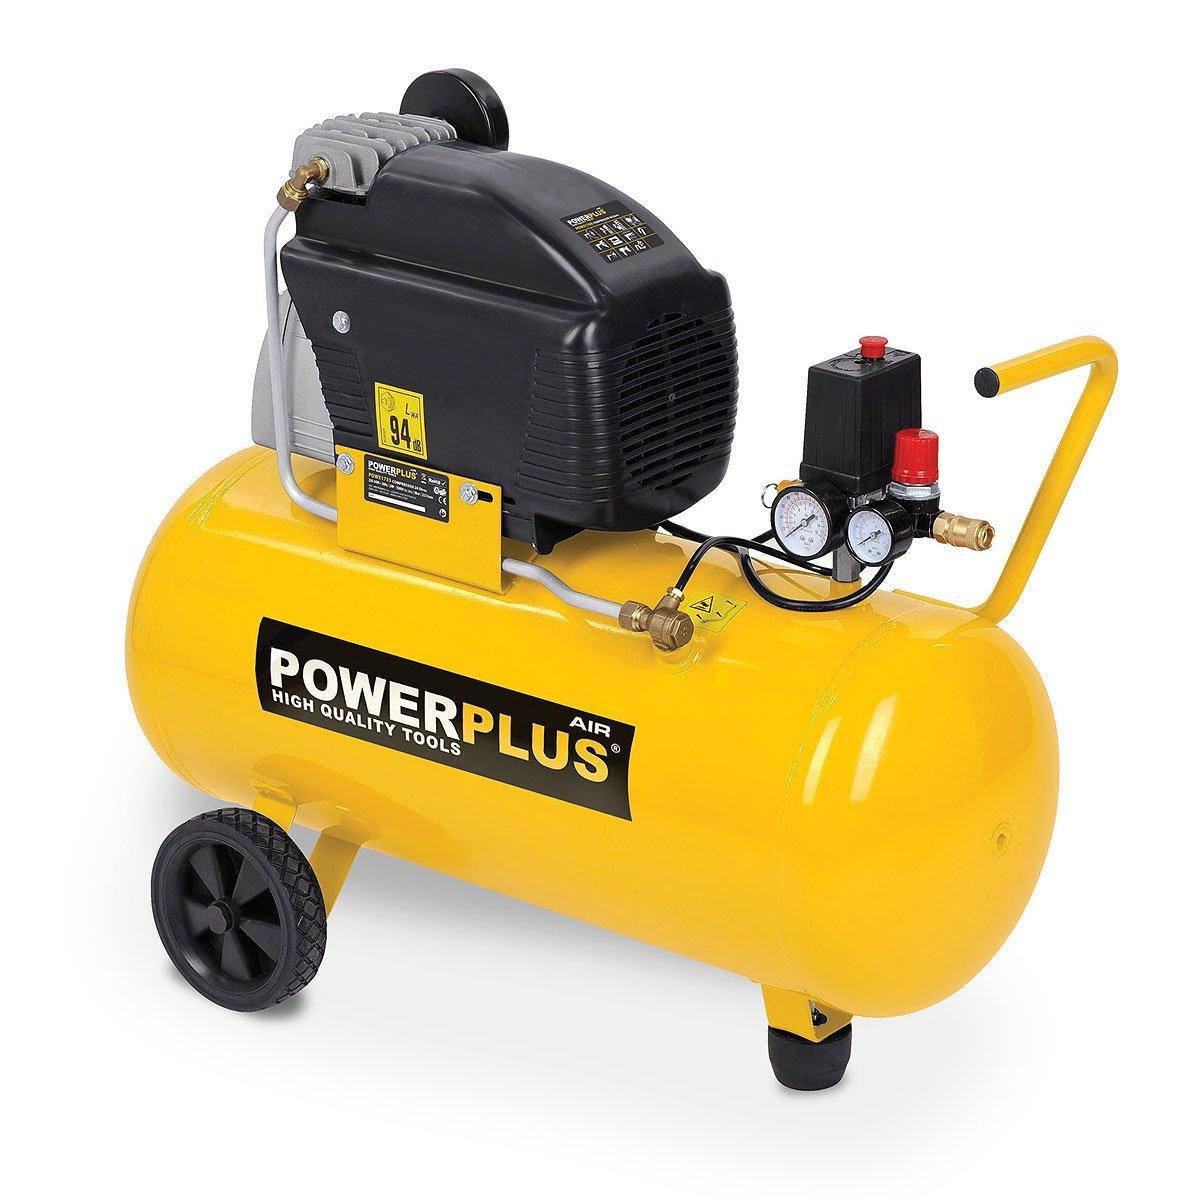 Powerplus POWX1760 Compressor - 1500 W - Werkdruk 8 bar - Tankinhoud 50 l: Amazon.es: Bricolaje y herramientas